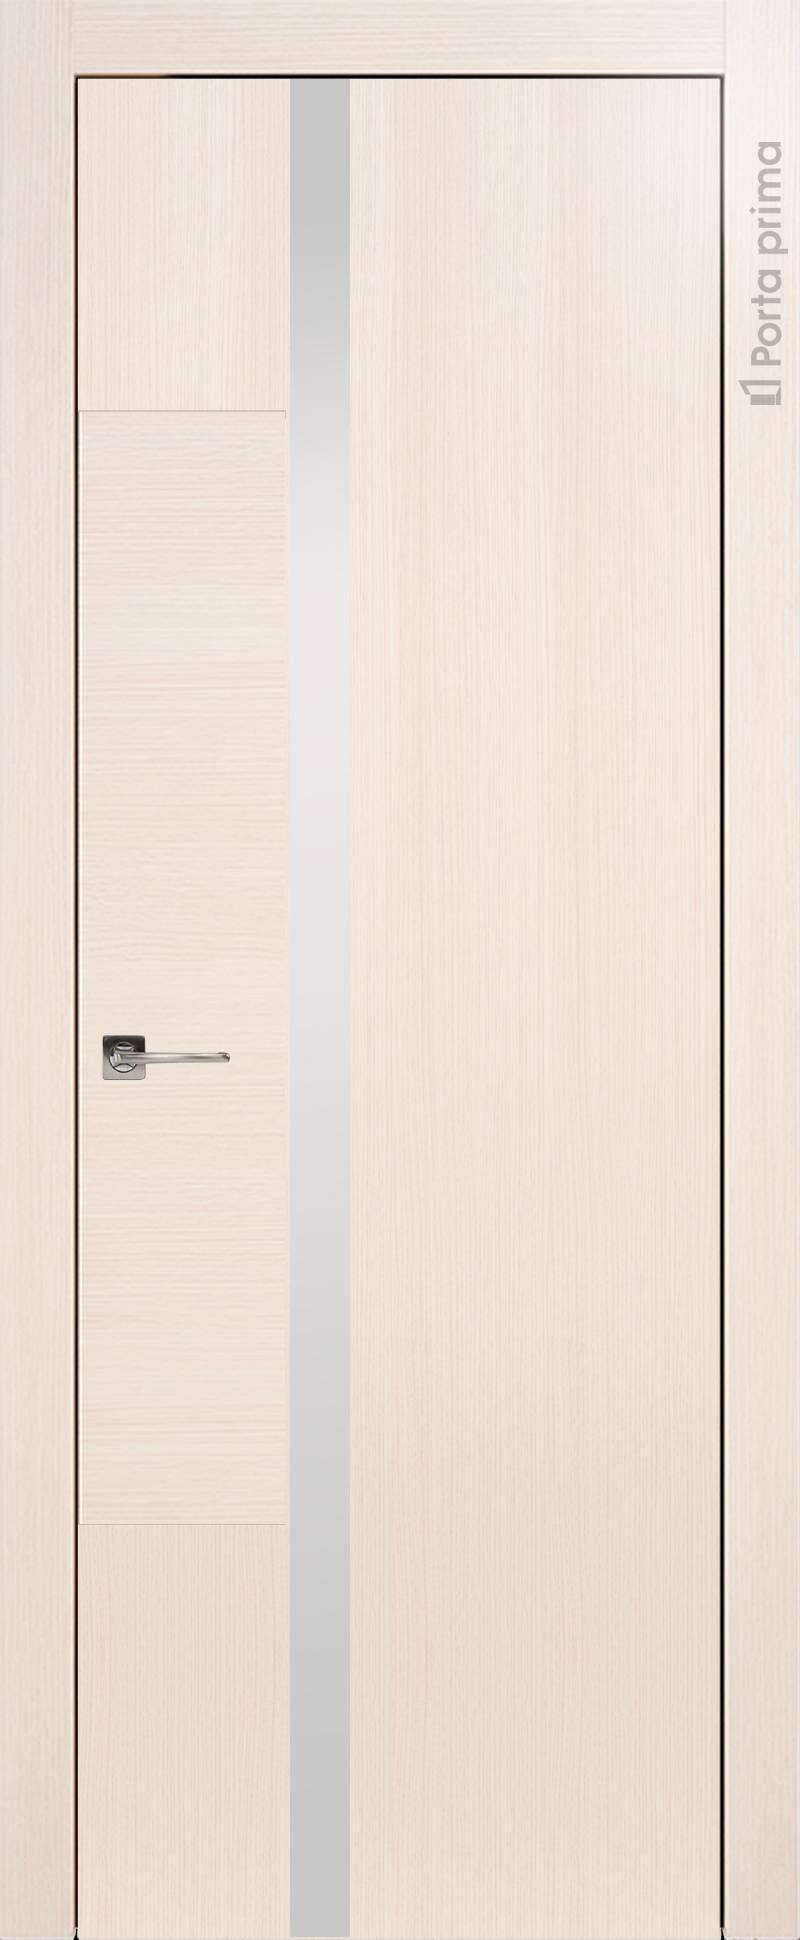 Tivoli Д-1 цвет - Беленый дуб Без стекла (ДГ)